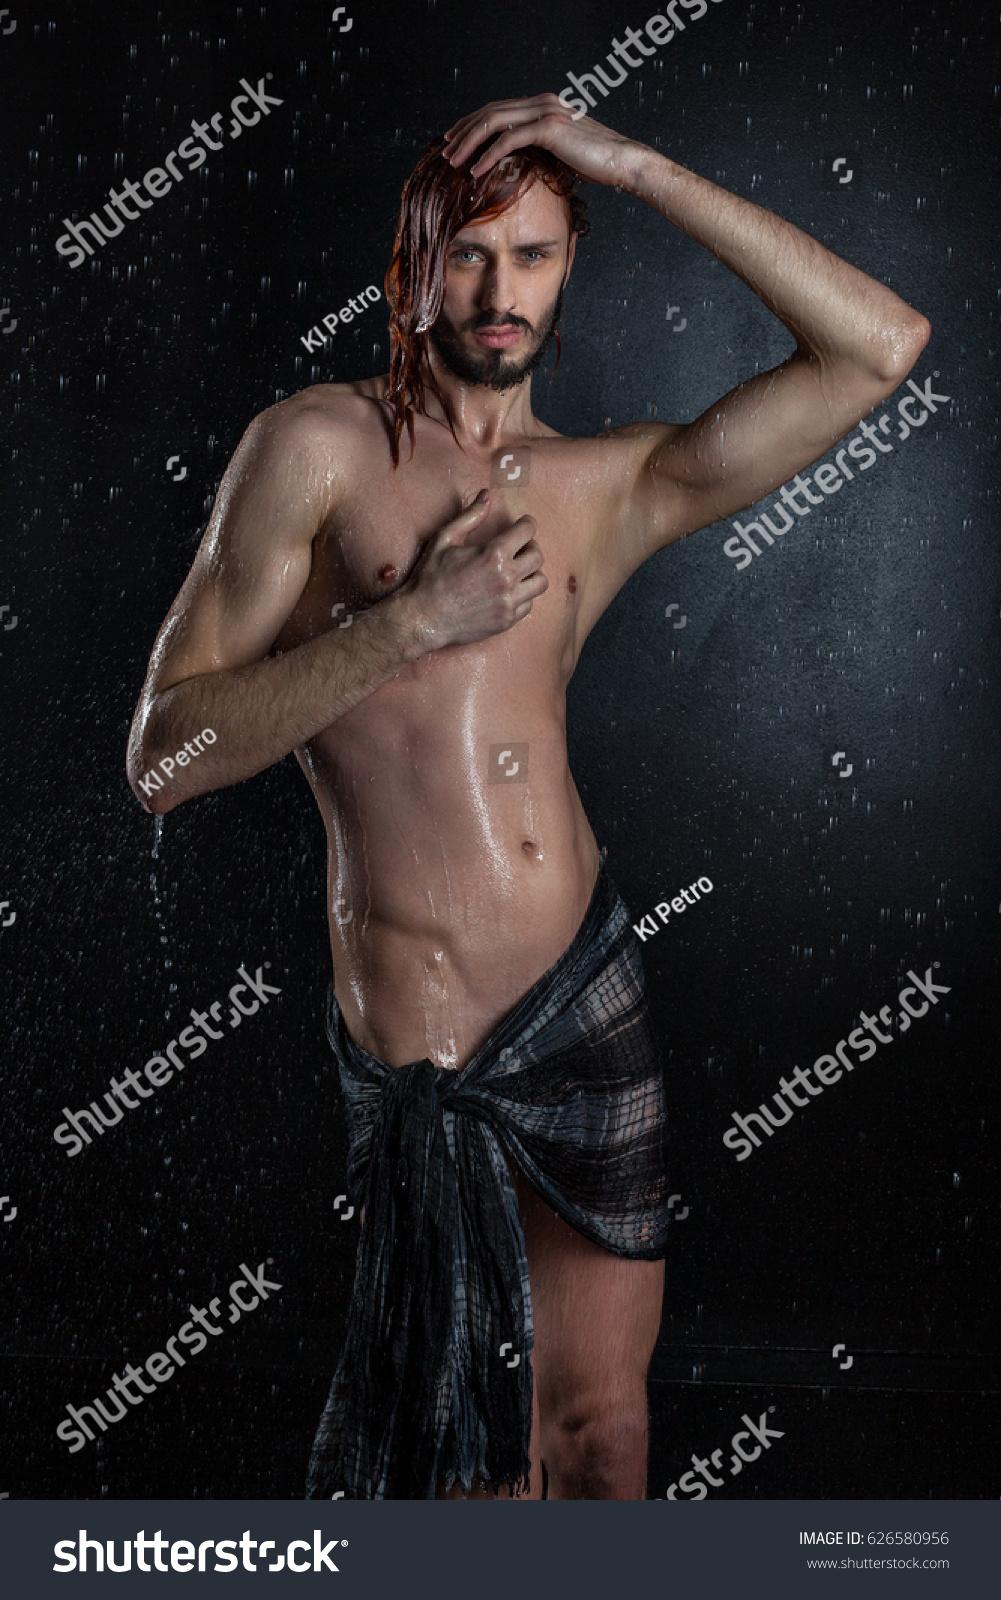 erotic naked wet man he has stock photo & image (royalty-free